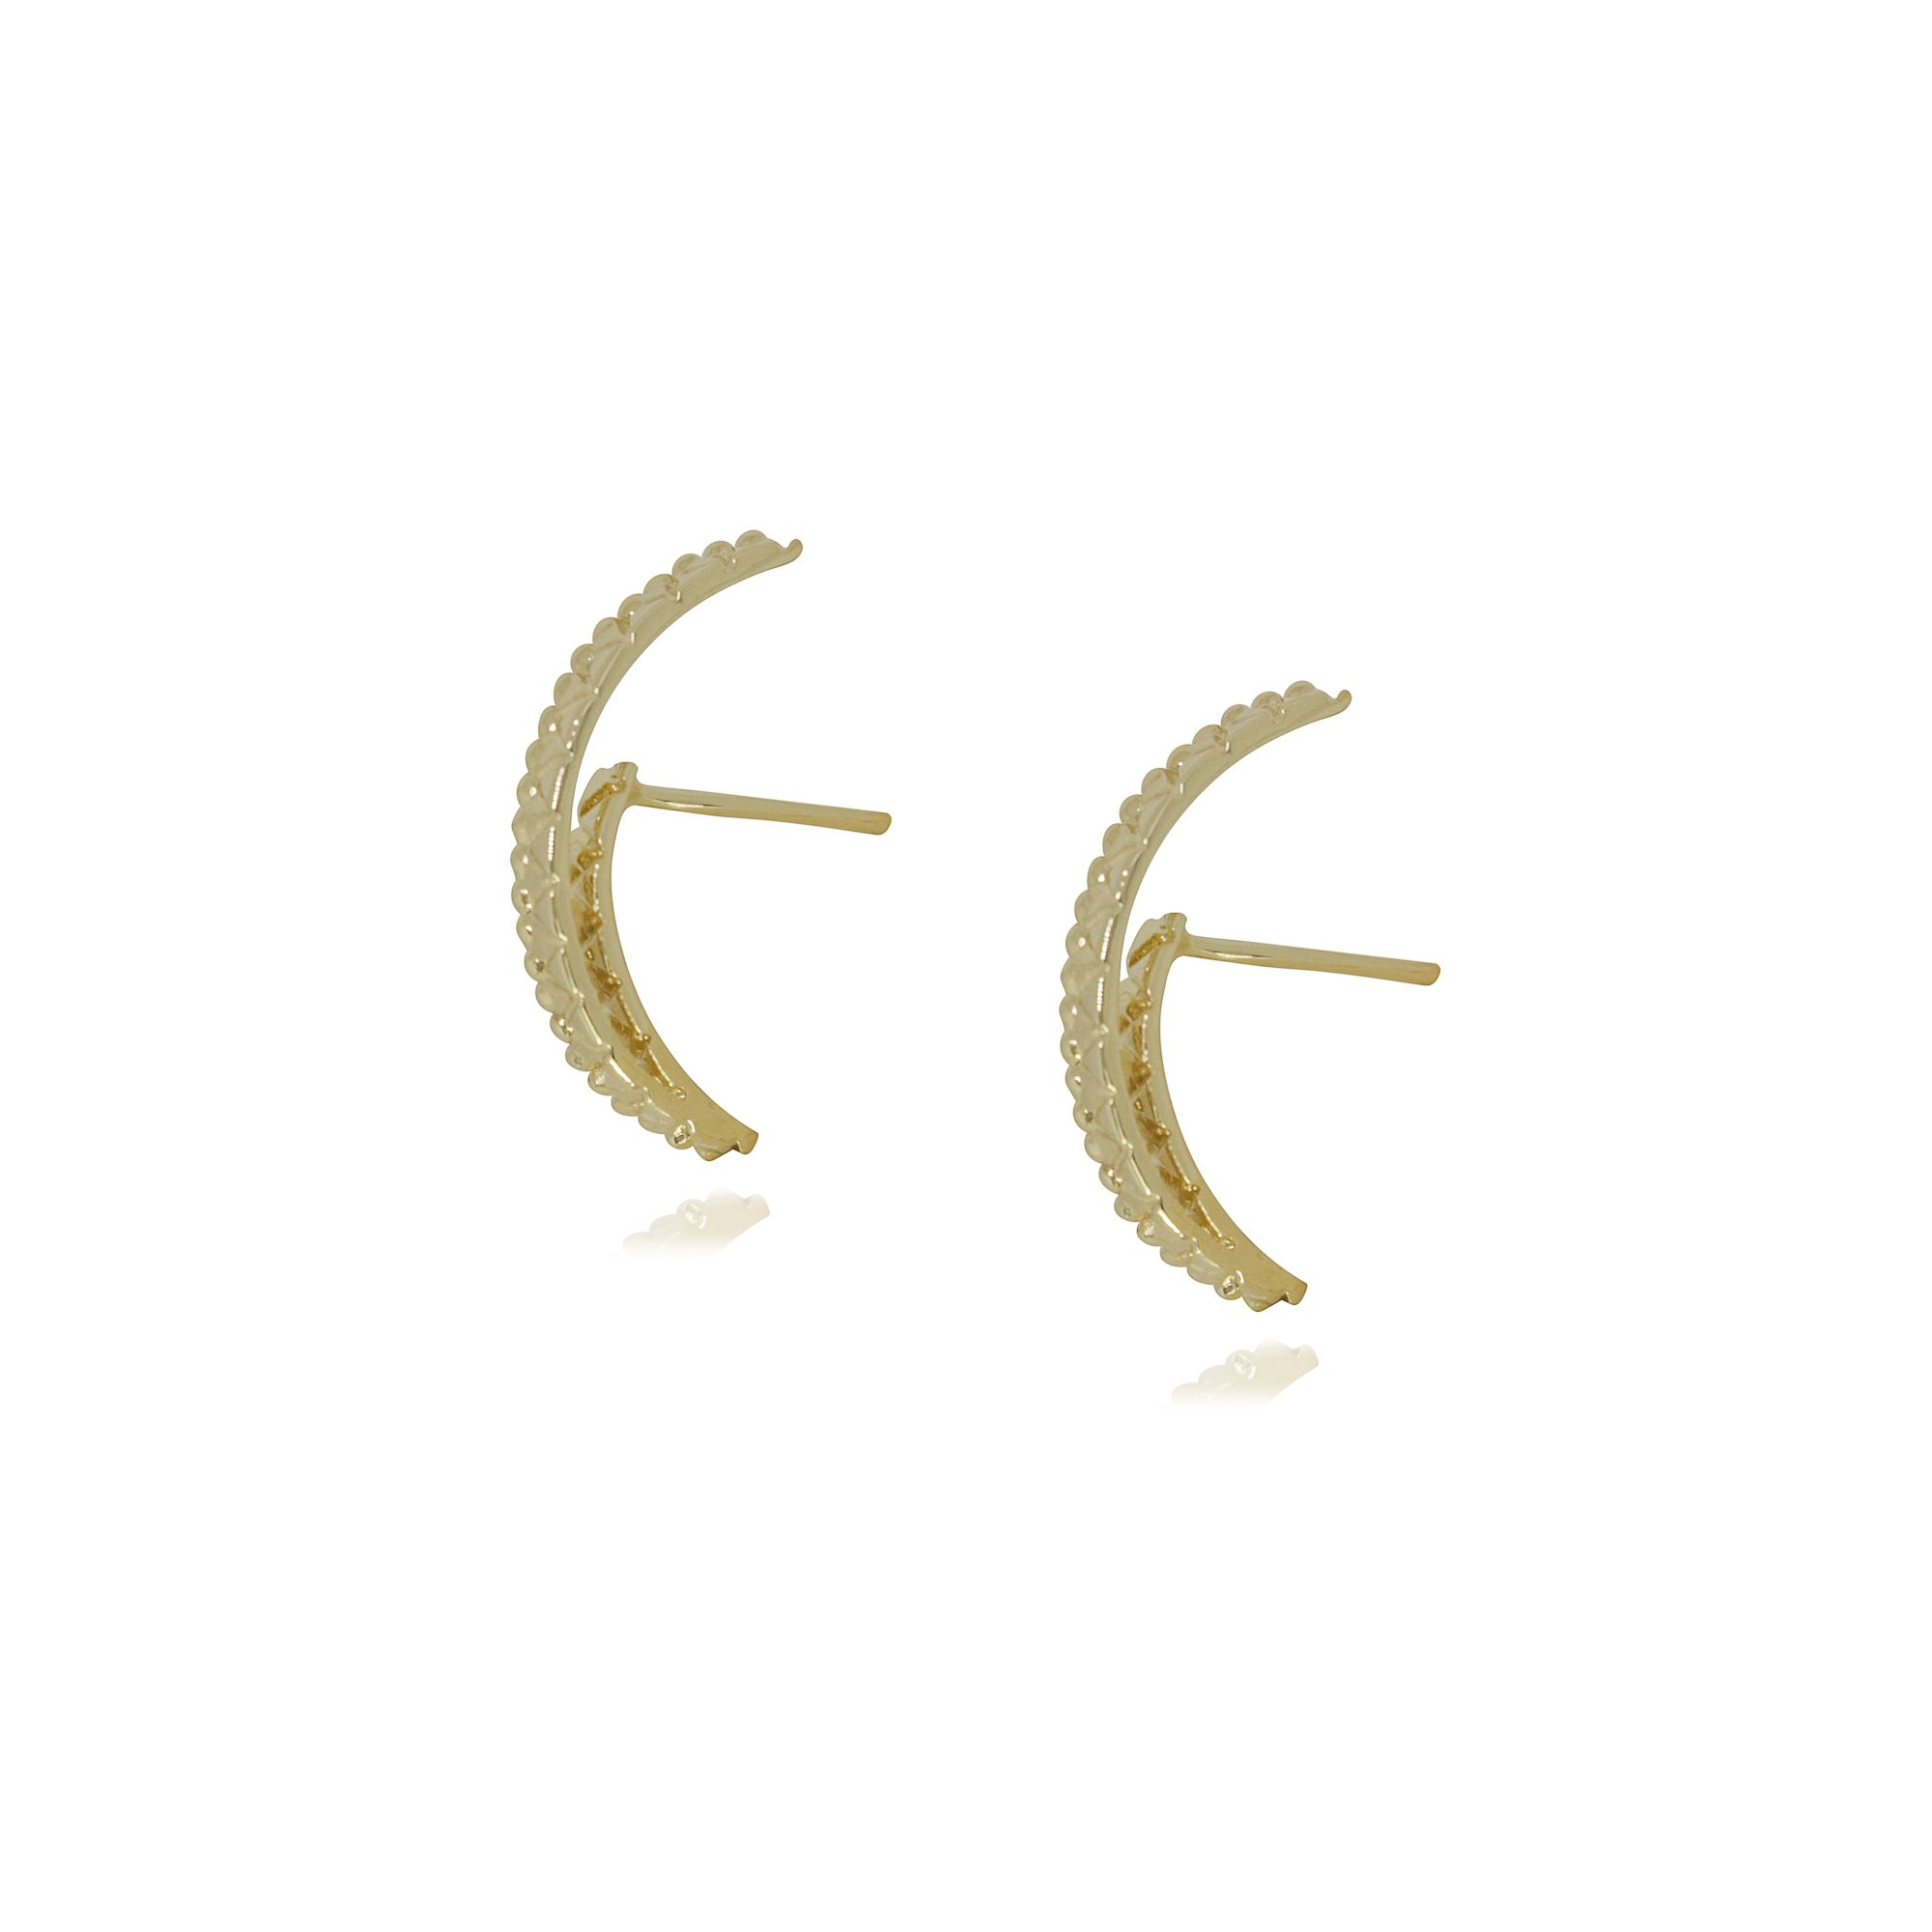 Brinco Semi joia Ornamento banhado a ouro 18k ou rhodium